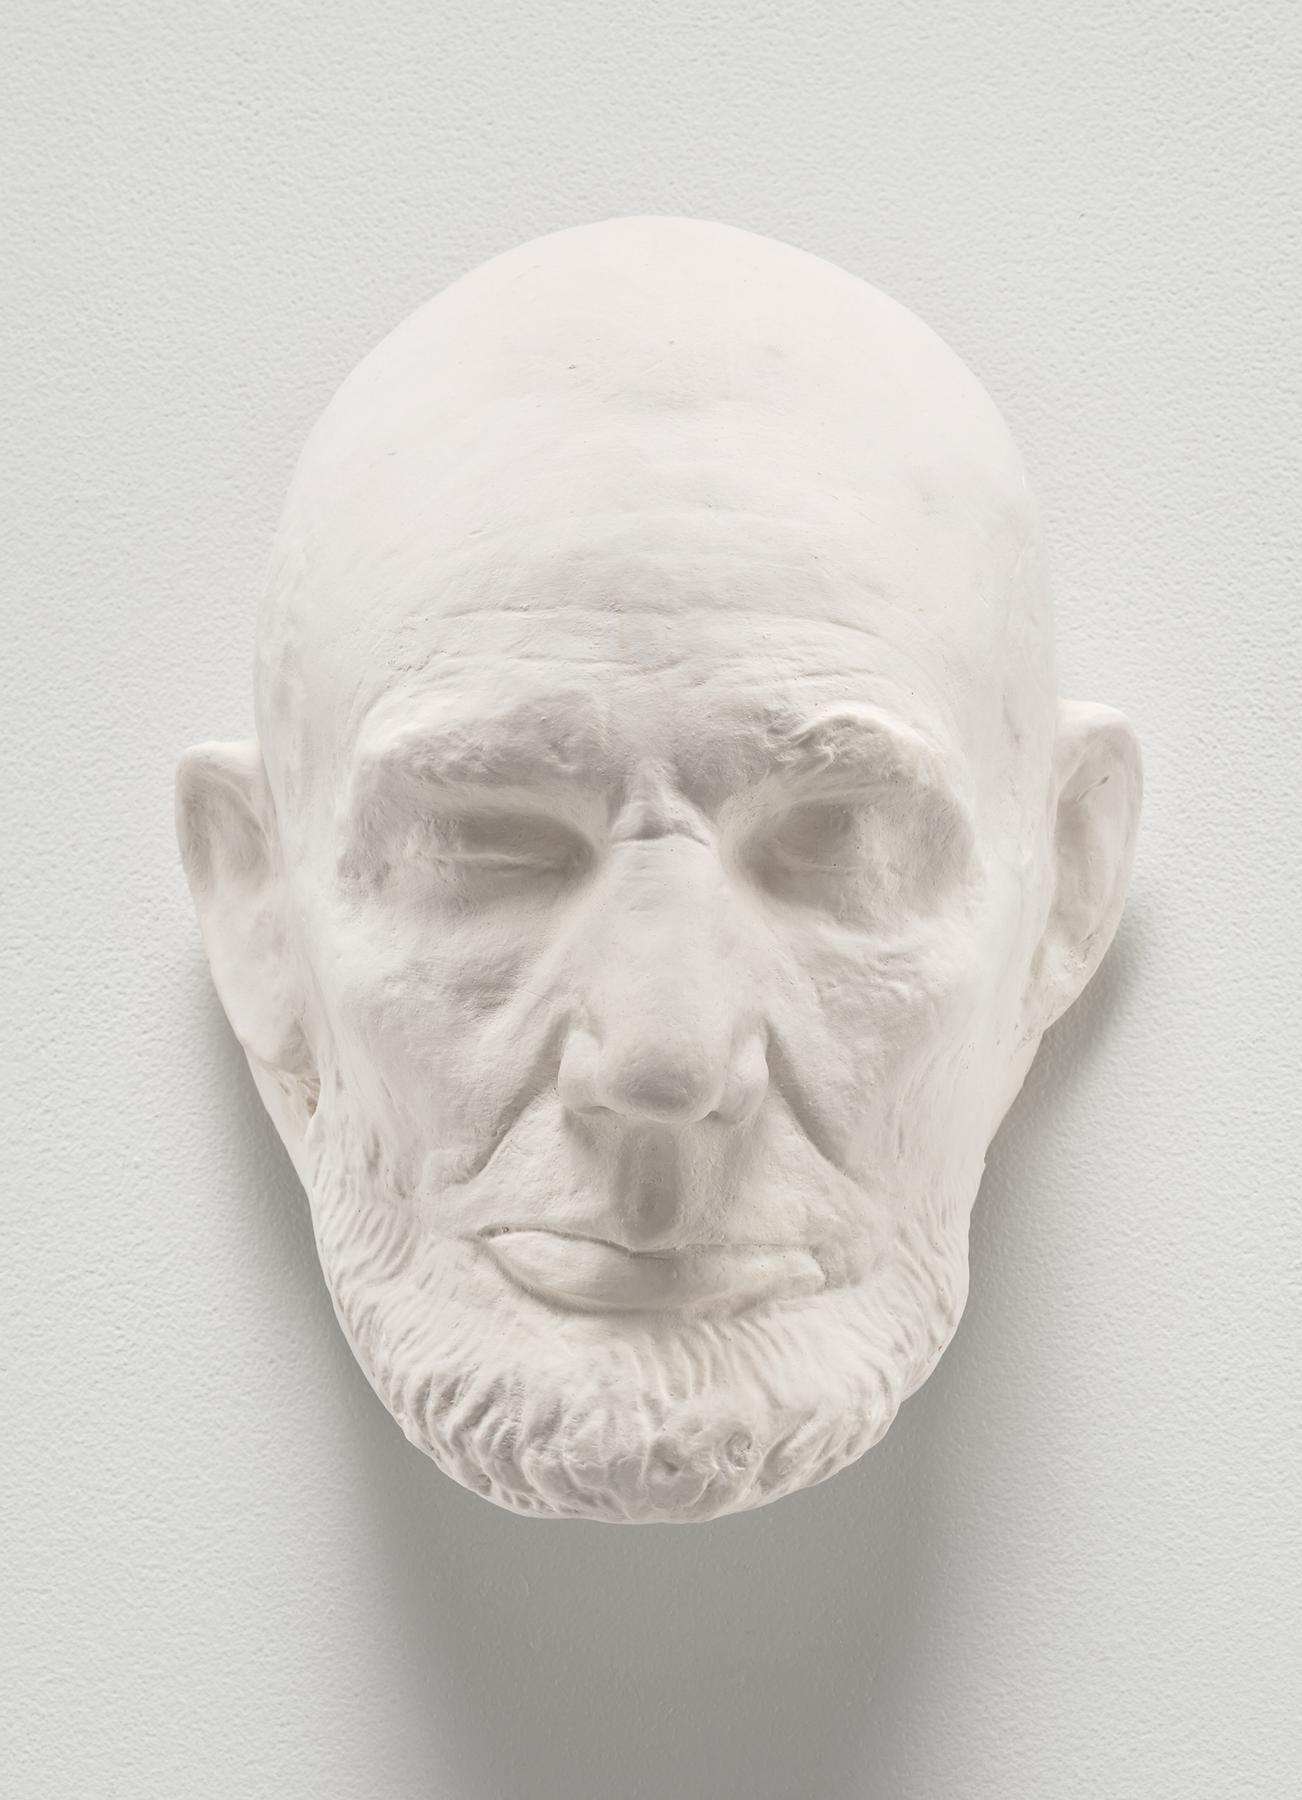 Edmier imagines (Abraham Lincoln (1865), President)